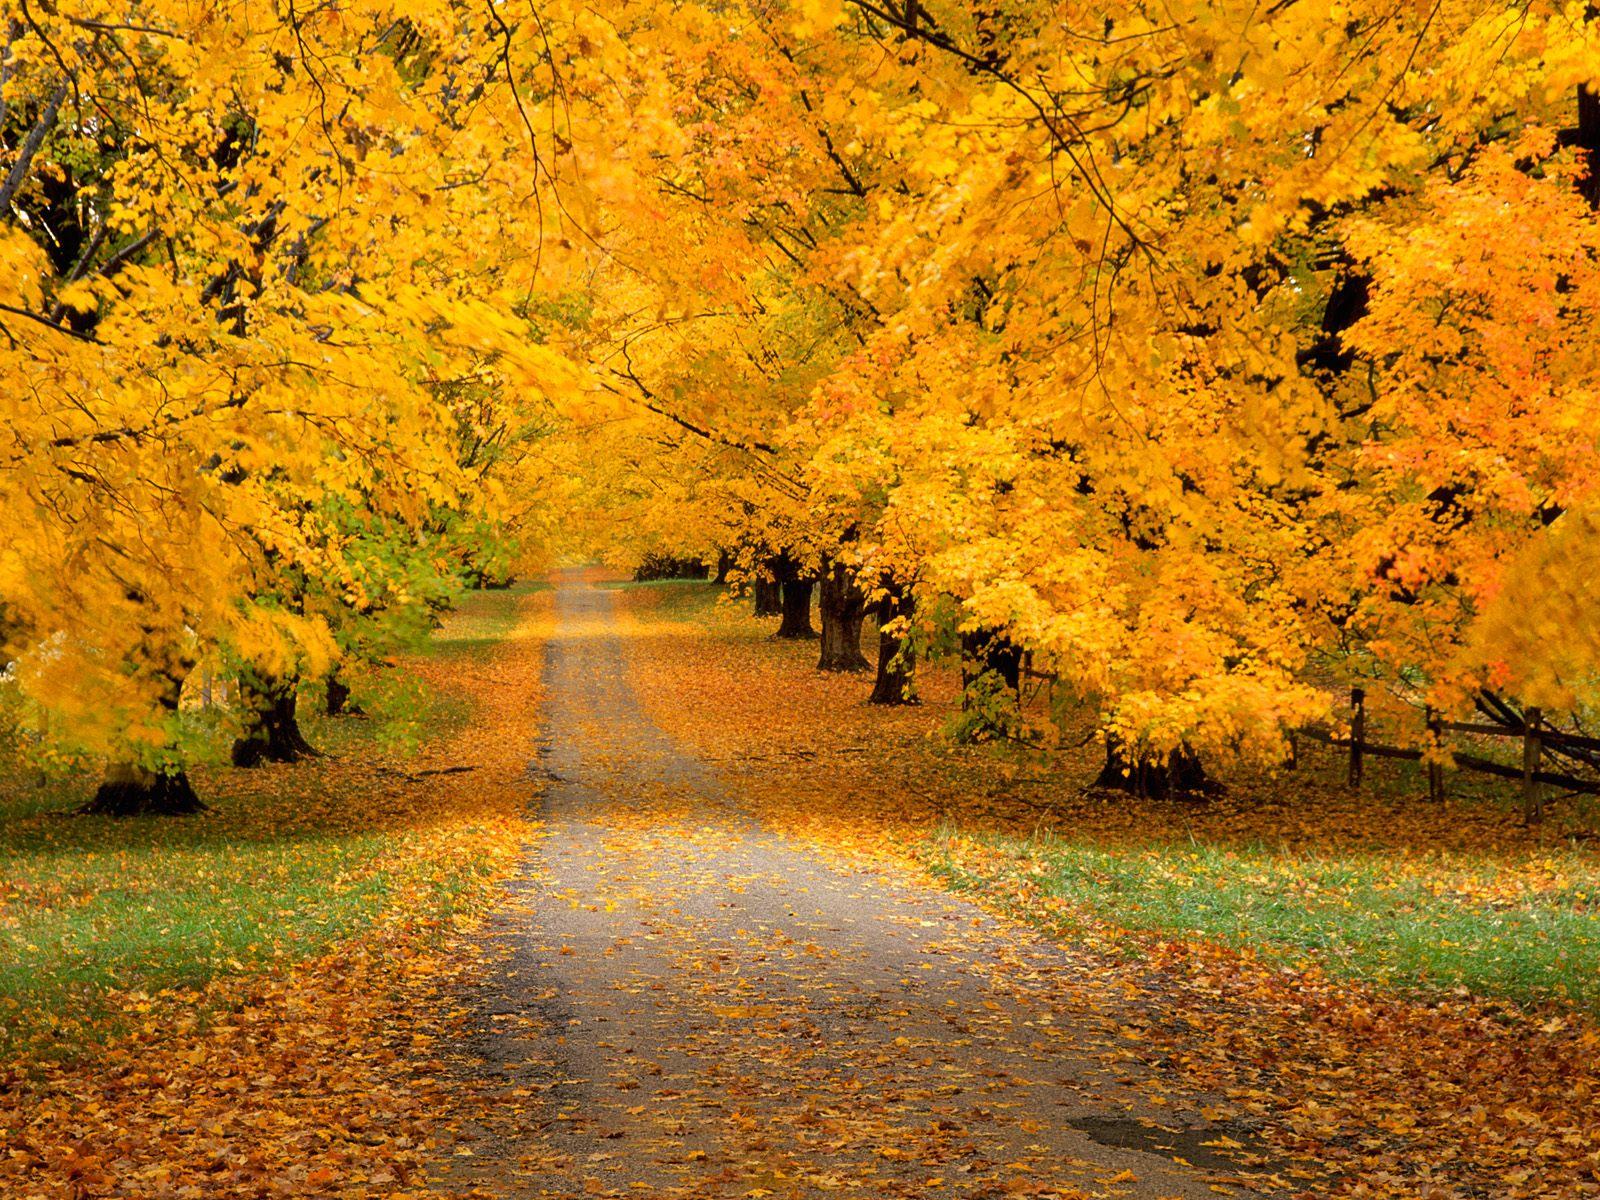 autumn wallpapers hd autumn saeson desktop wallpaper 1600x1200